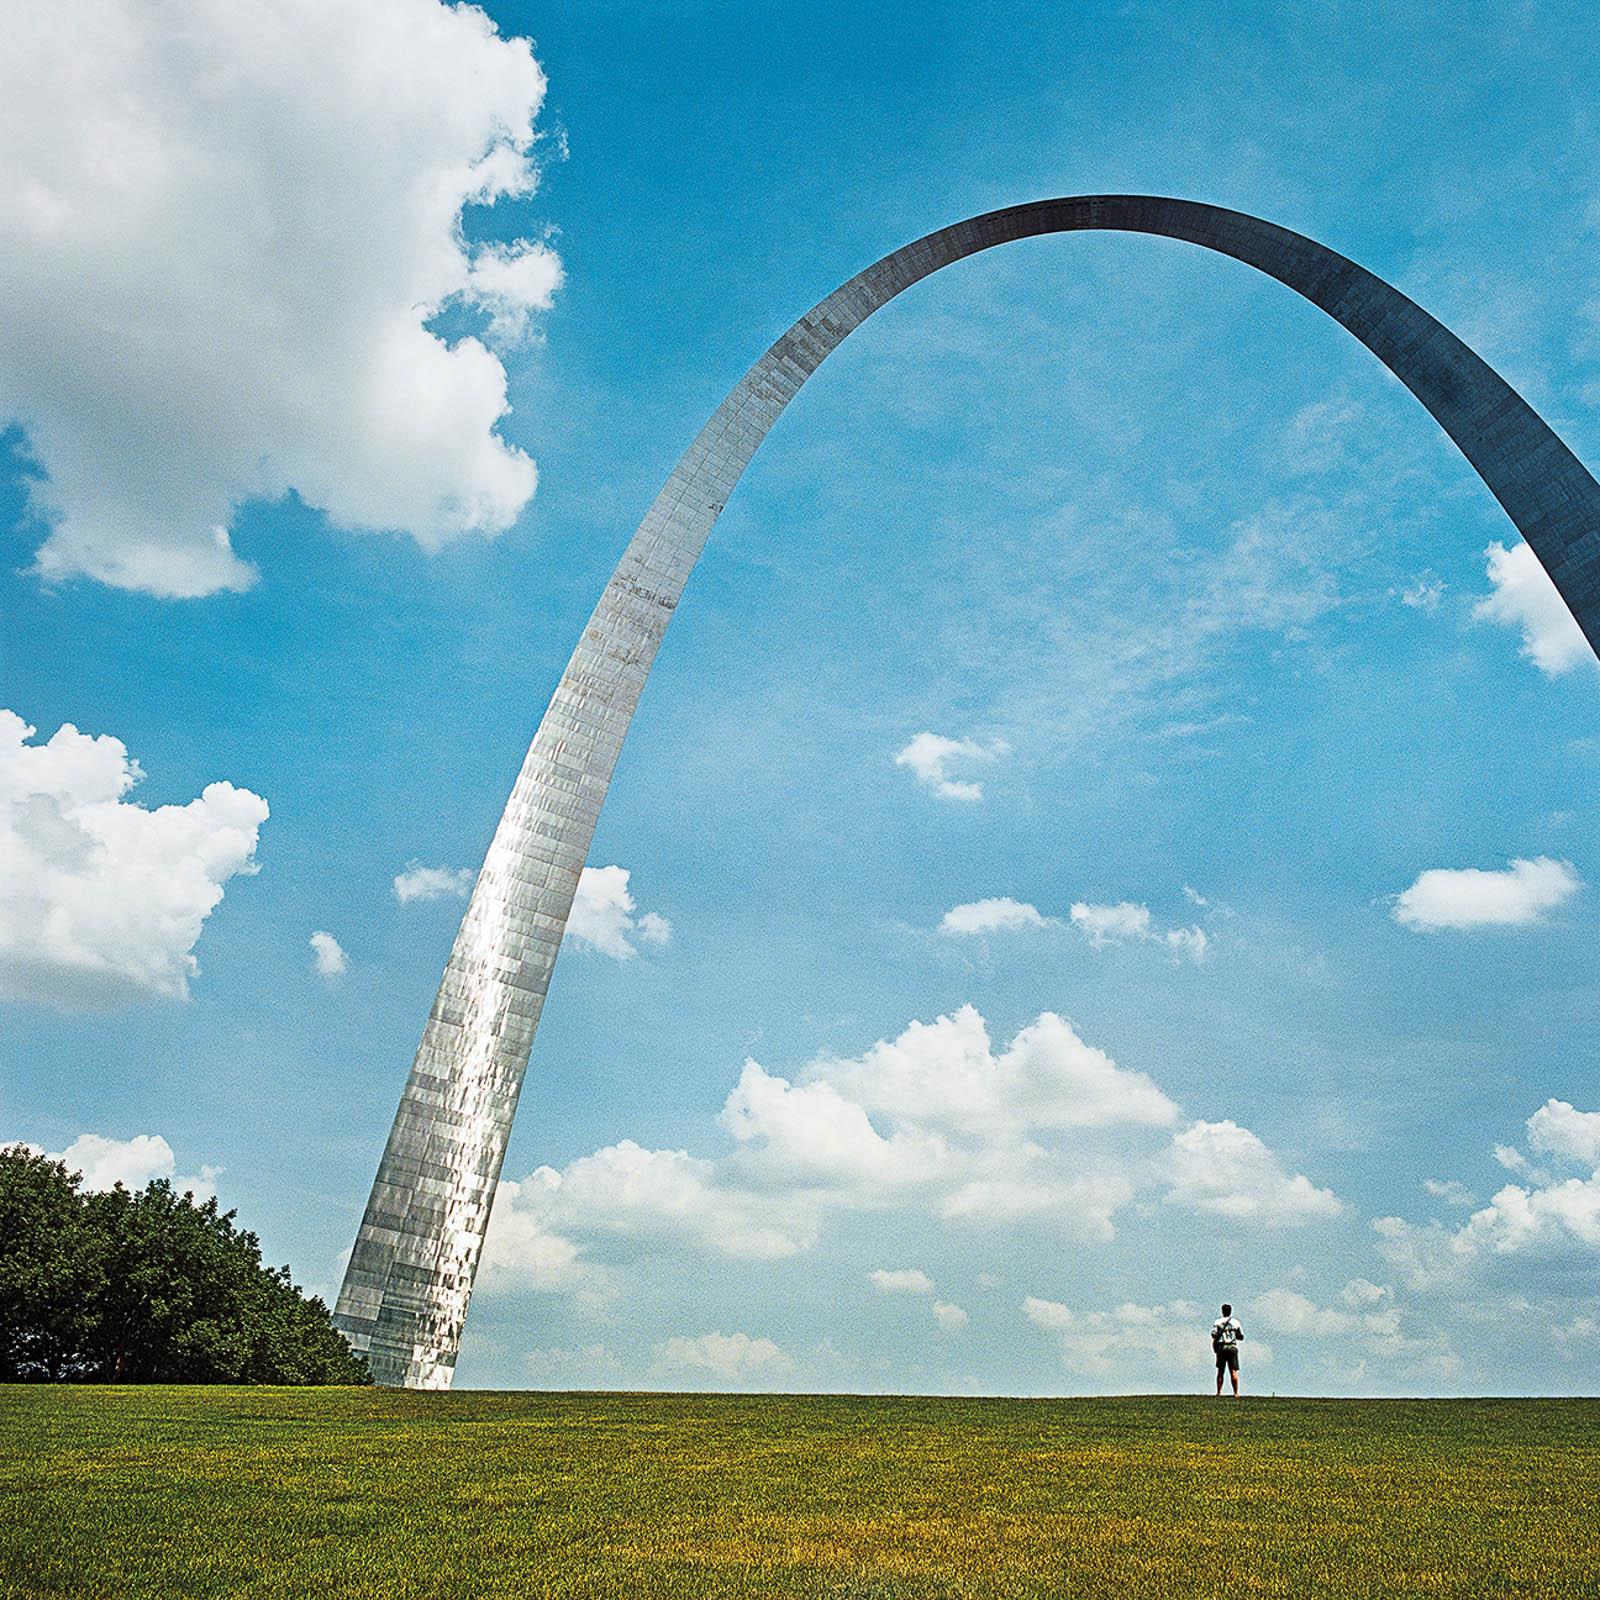 Man at The Arch, St Louis, Missouri 1999